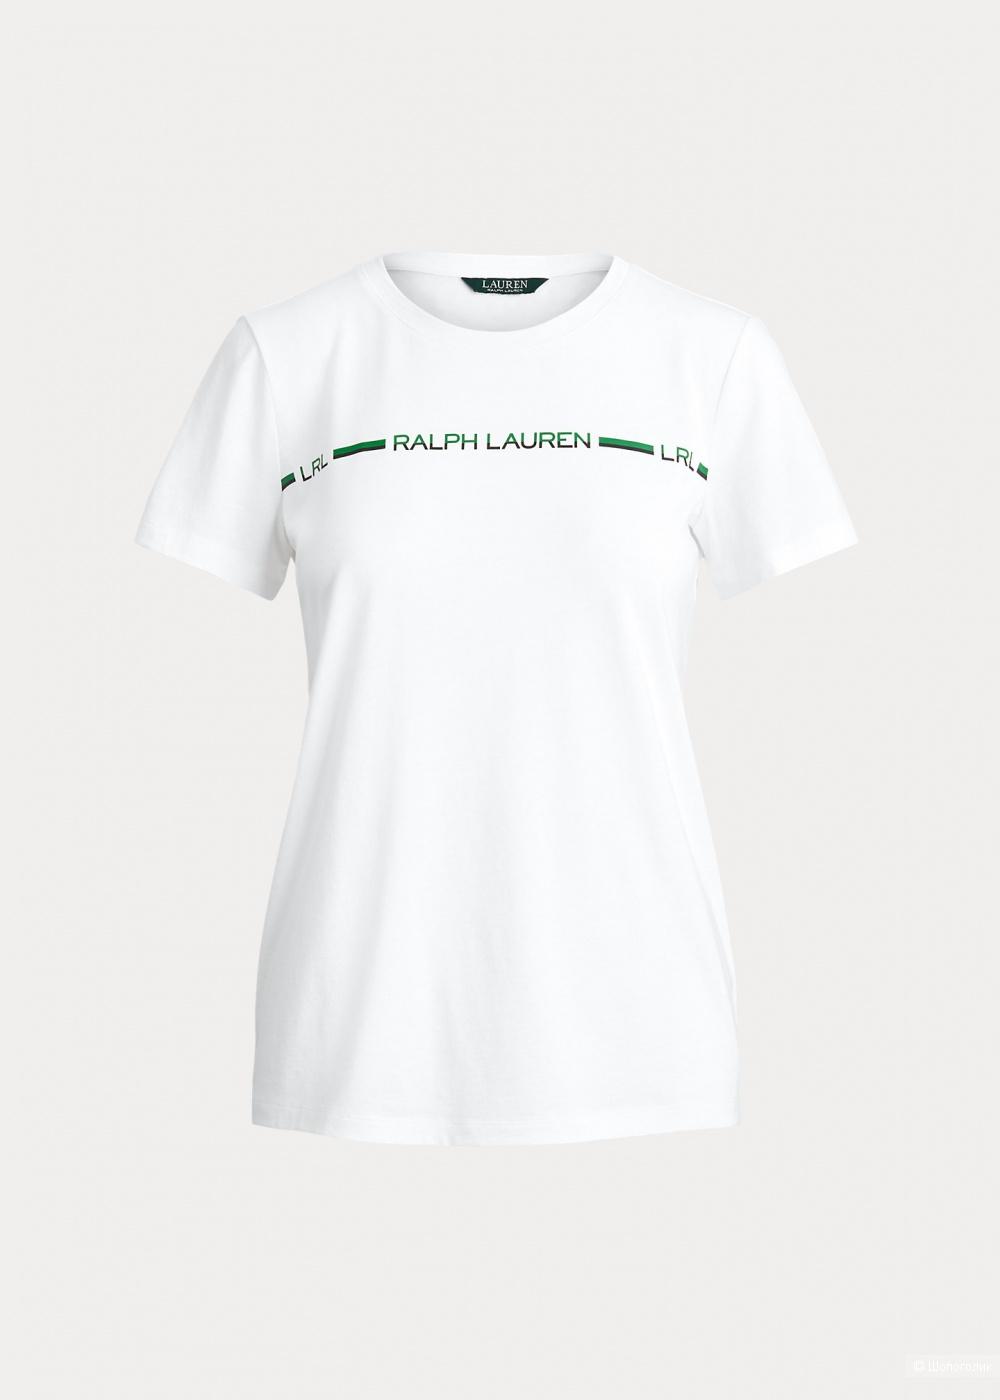 Футболка RALPH LAUREN, размер М